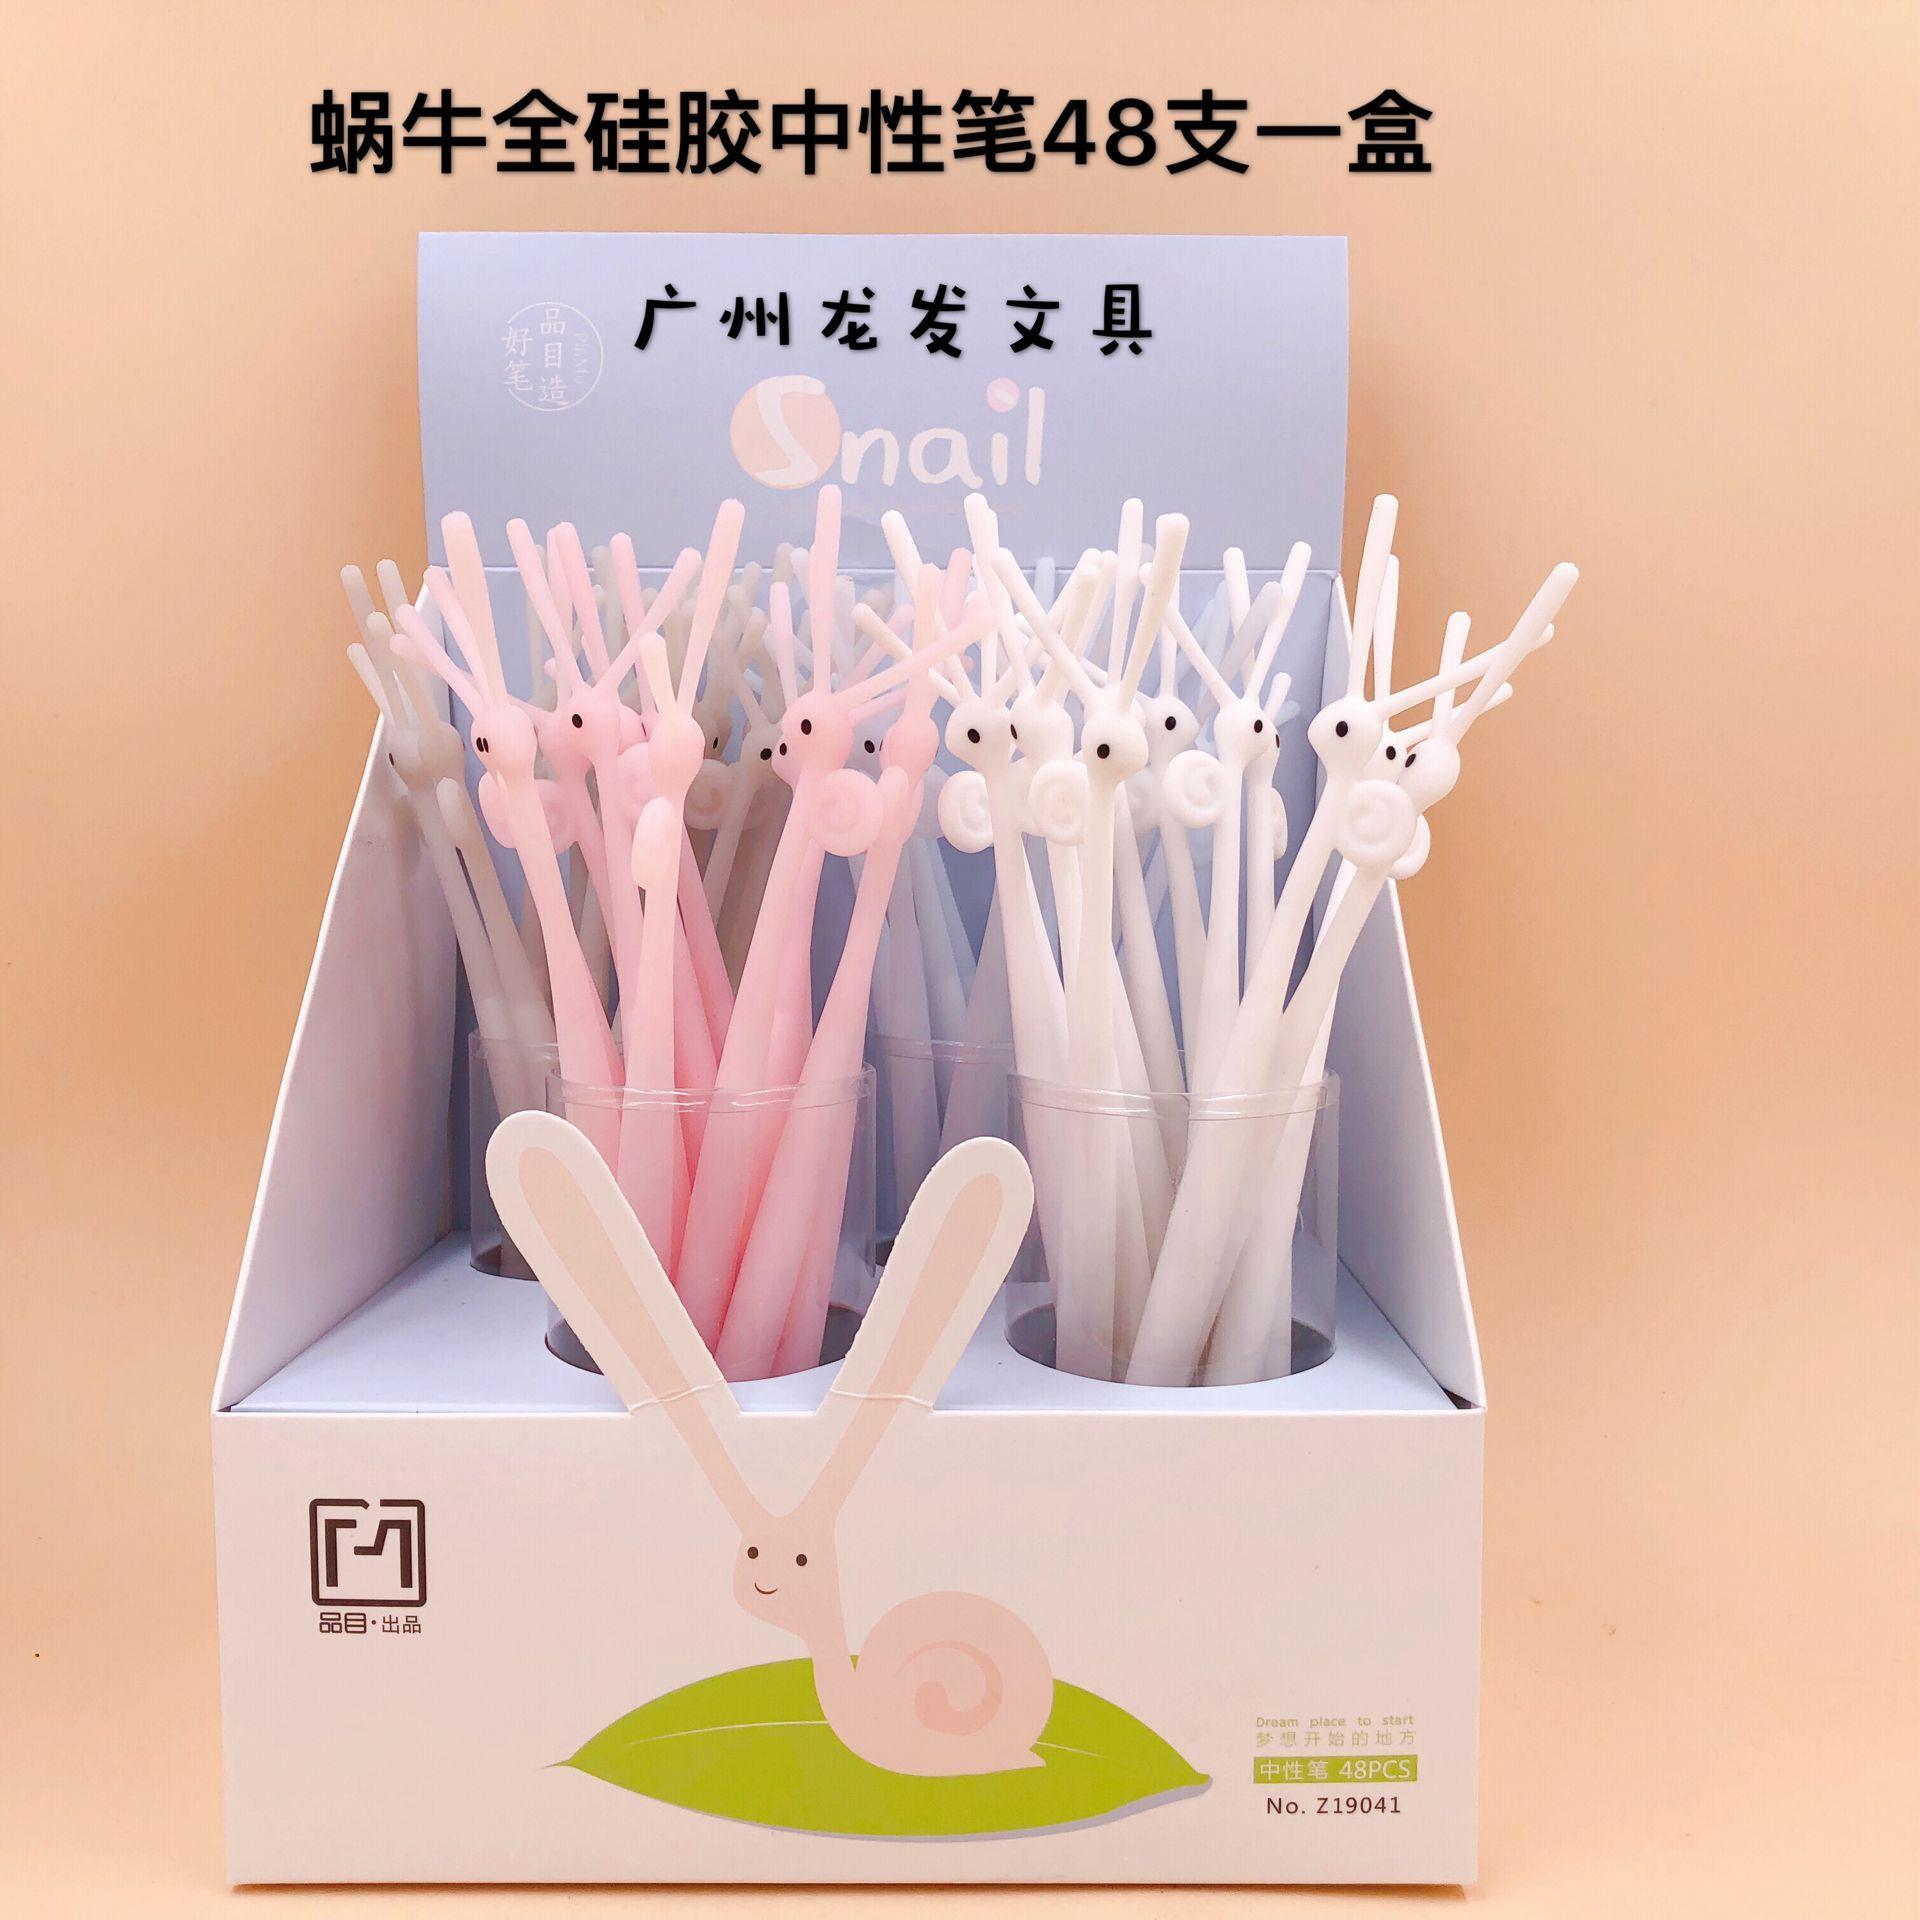 1 Pcs Kawaii Gel Pens Snail Sen Deer Rabbit Black Gel Ink Pens Pens For Writing Cute Stationery Office School Supplies 0.5mm